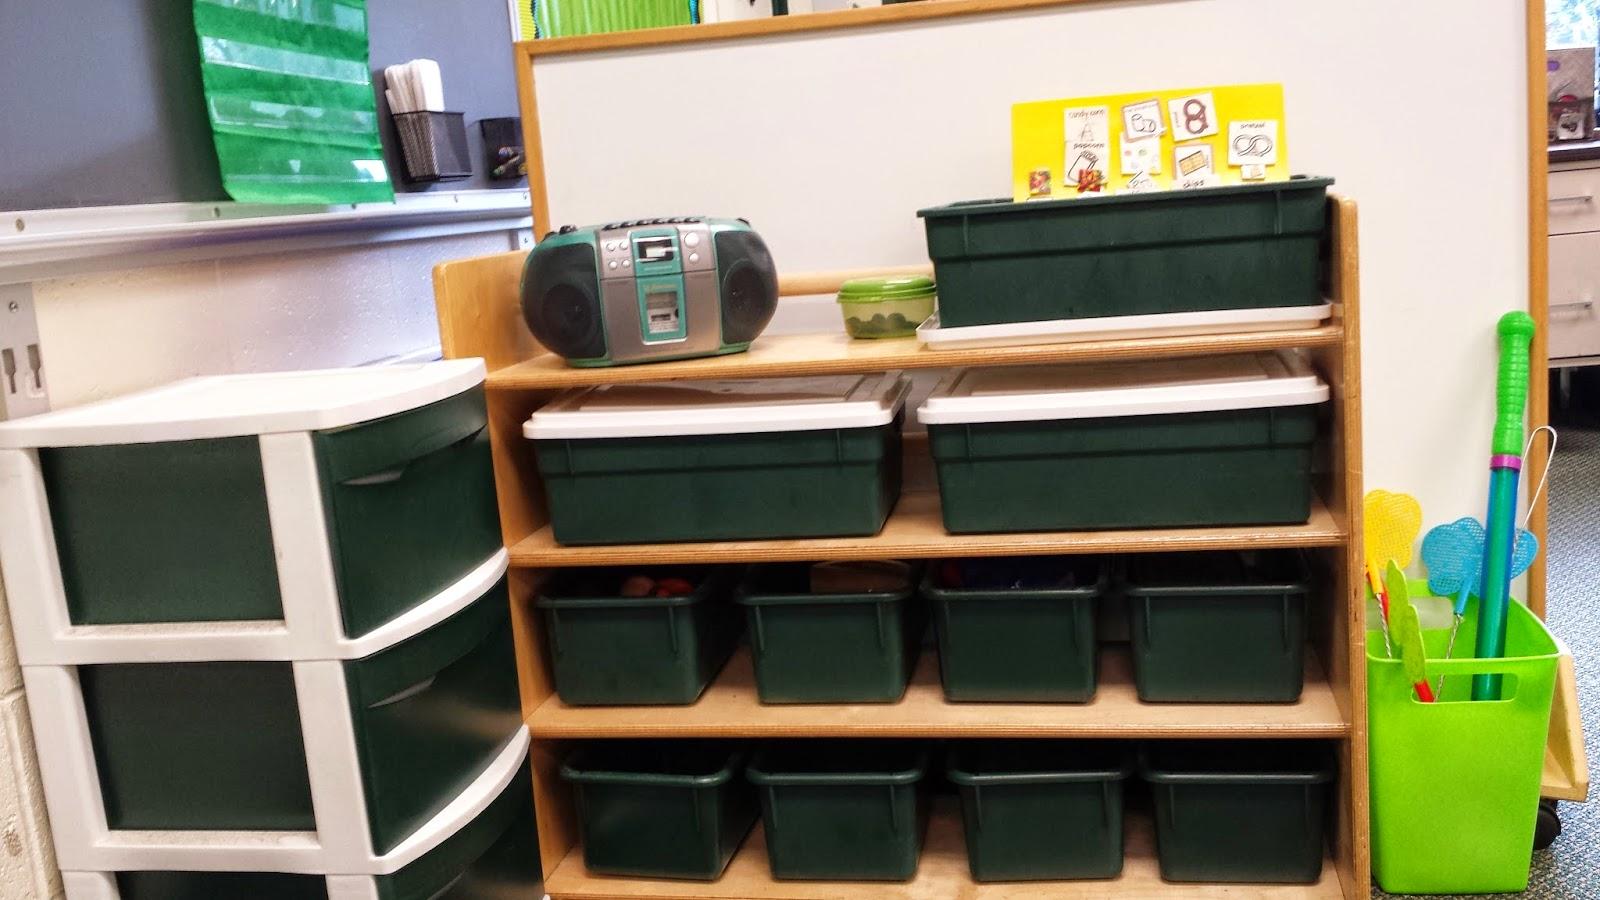 photo of green bins on shelves